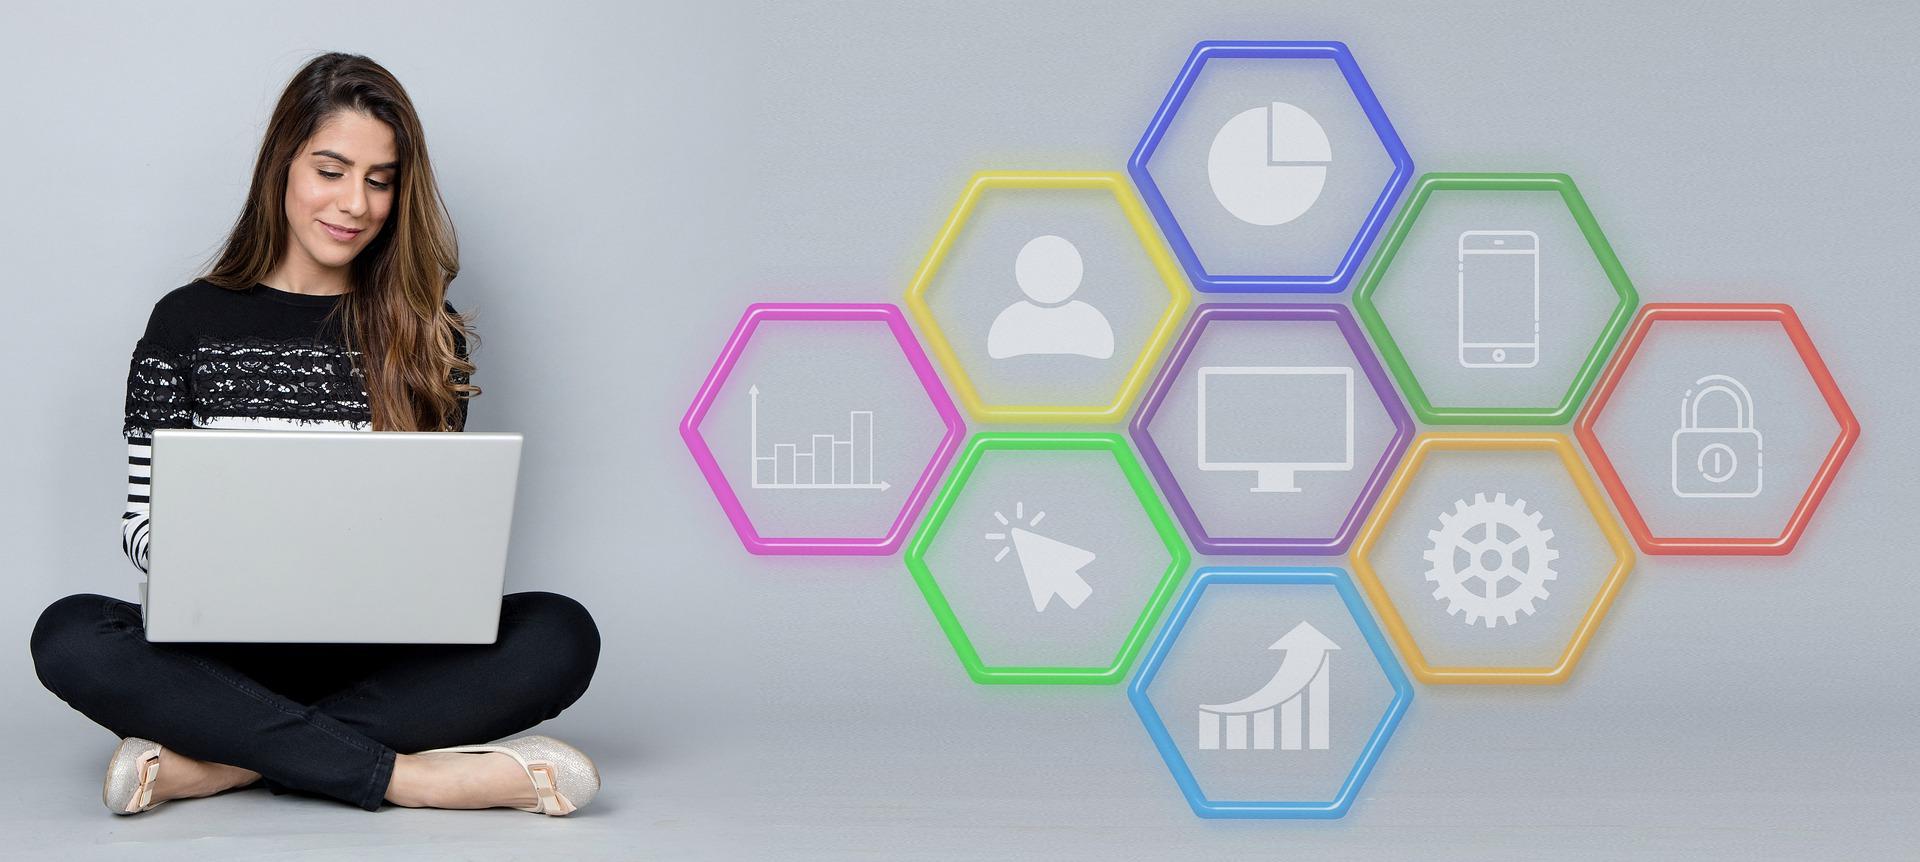 hire-digital-marketing-professionals-best-digital-marketing-agency-shirudigi